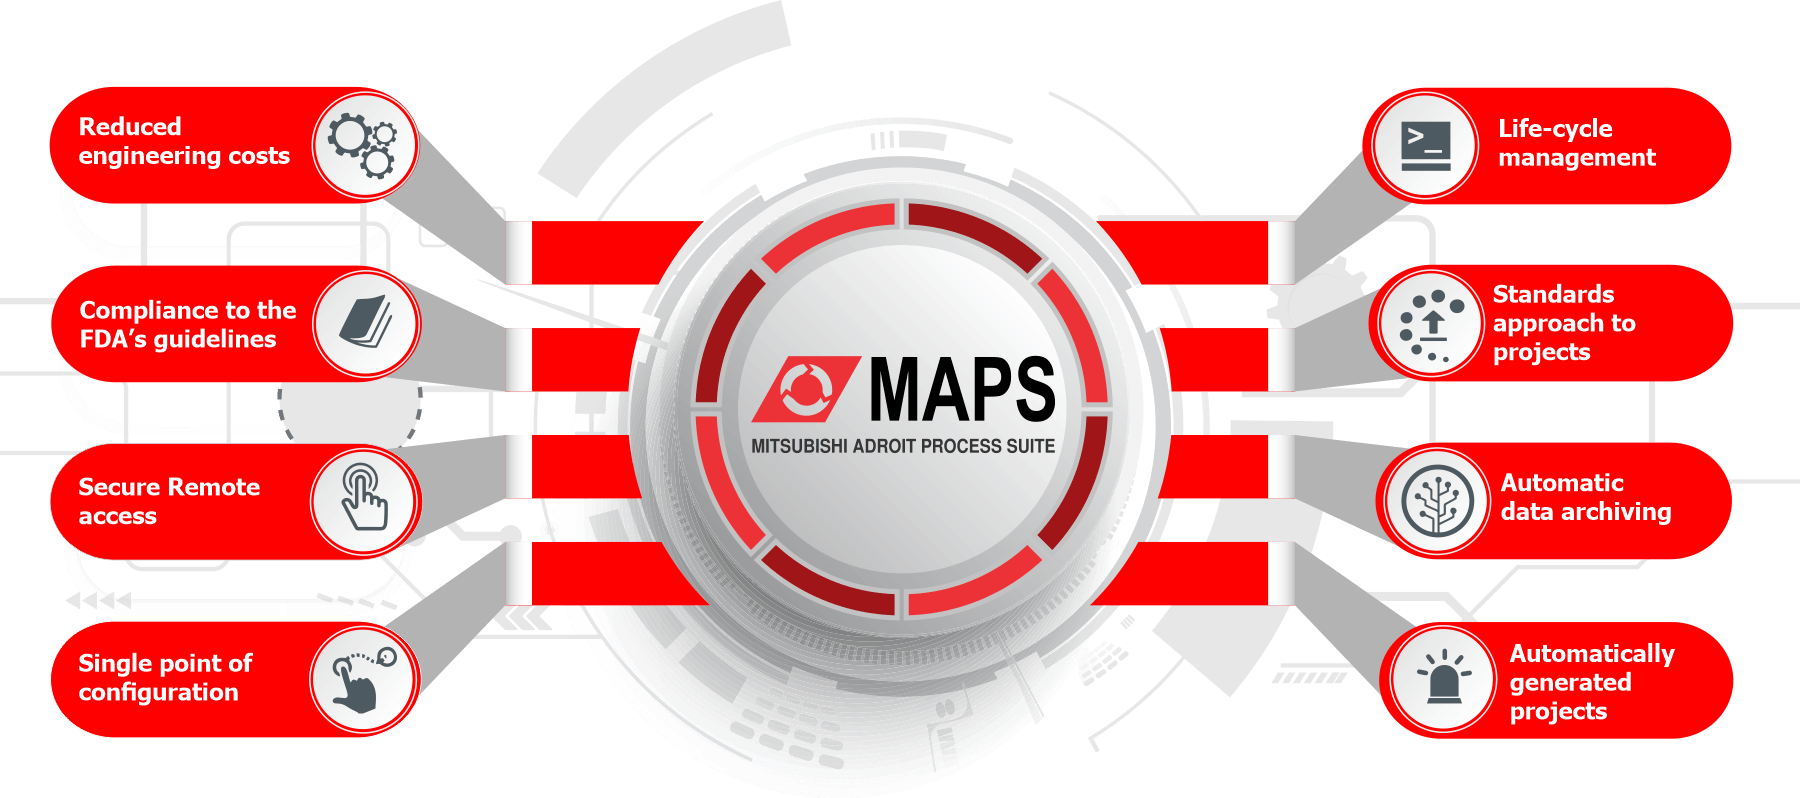 Mitsubishi Adroit Process Suite (MAPS) - Maps SCADA